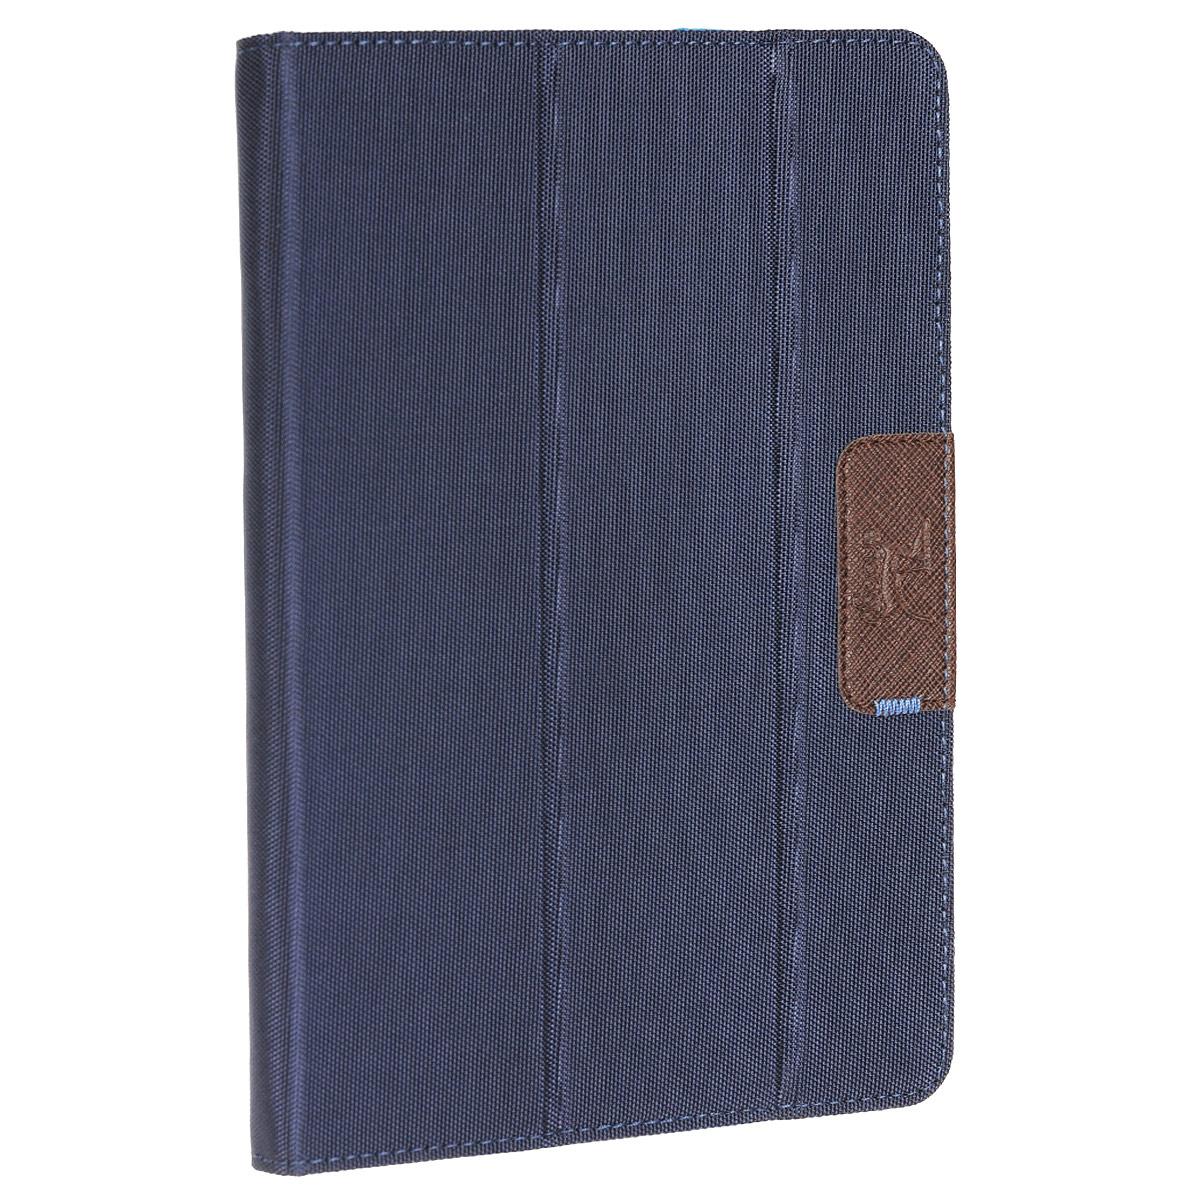 "Snoogy SN-FCU785 чехол для планшетов 7.85"", Blue (ткань)"